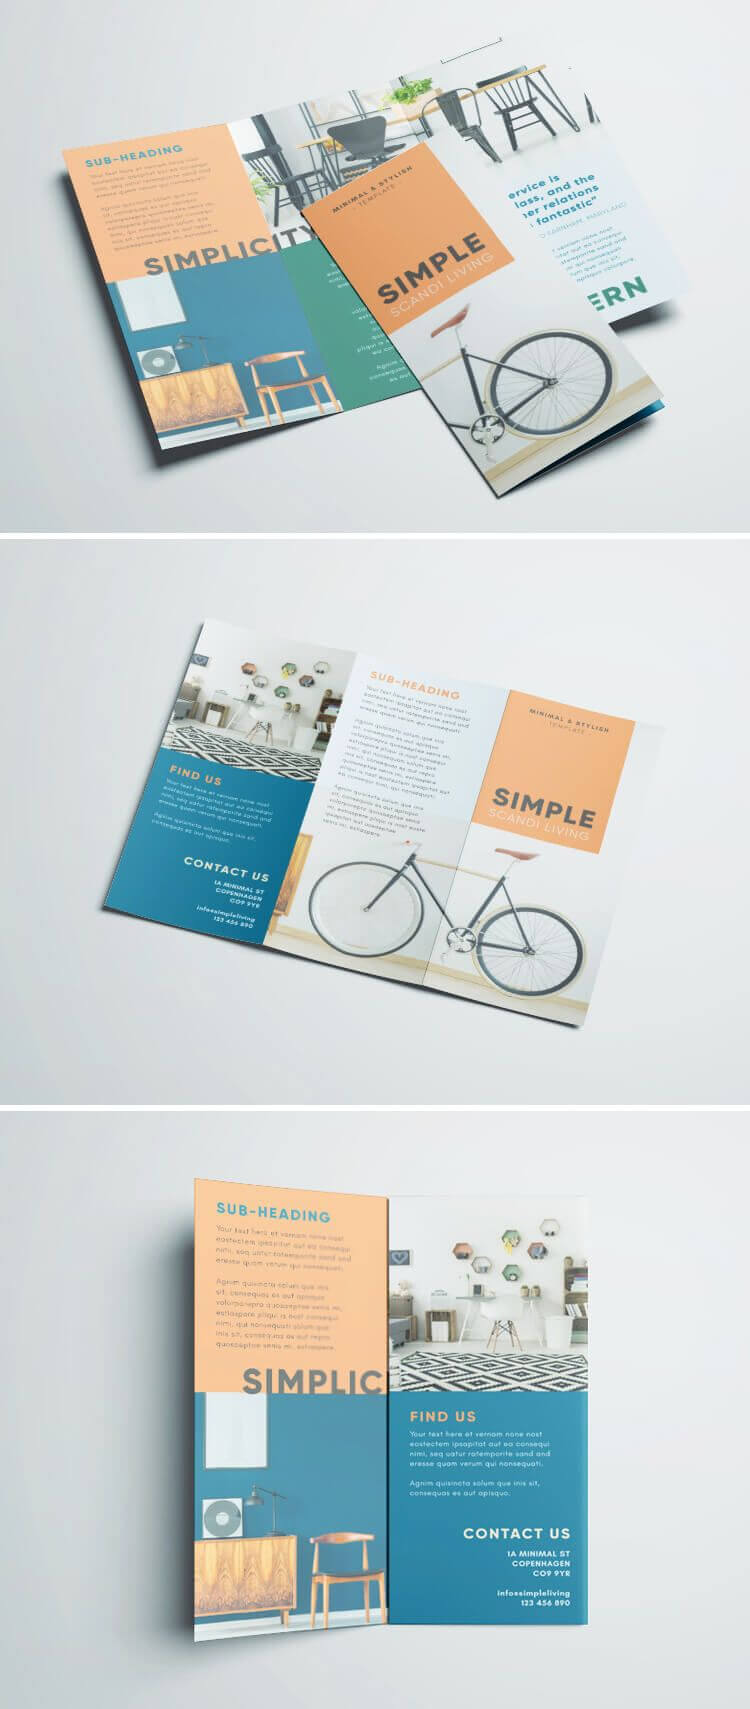 Simple Tri Fold Brochure   Brochure Design Idea   Brochure Inside Tri Fold Brochure Template Indesign Free Download